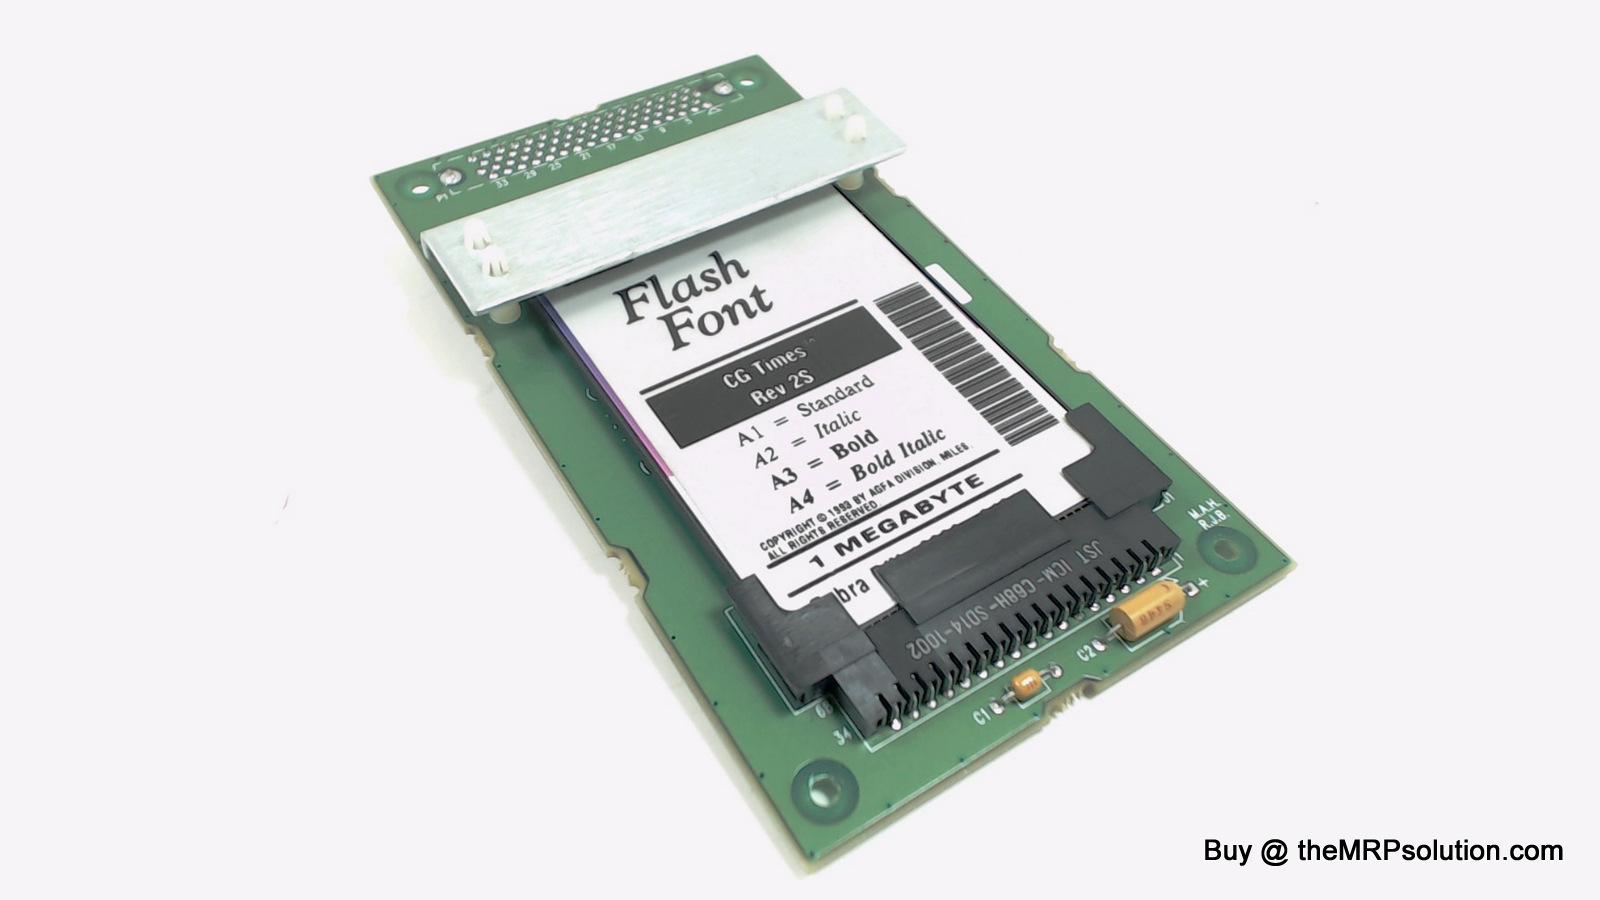 ZEBRA 46591 INTERNAL MEMORY CARD Refurbished